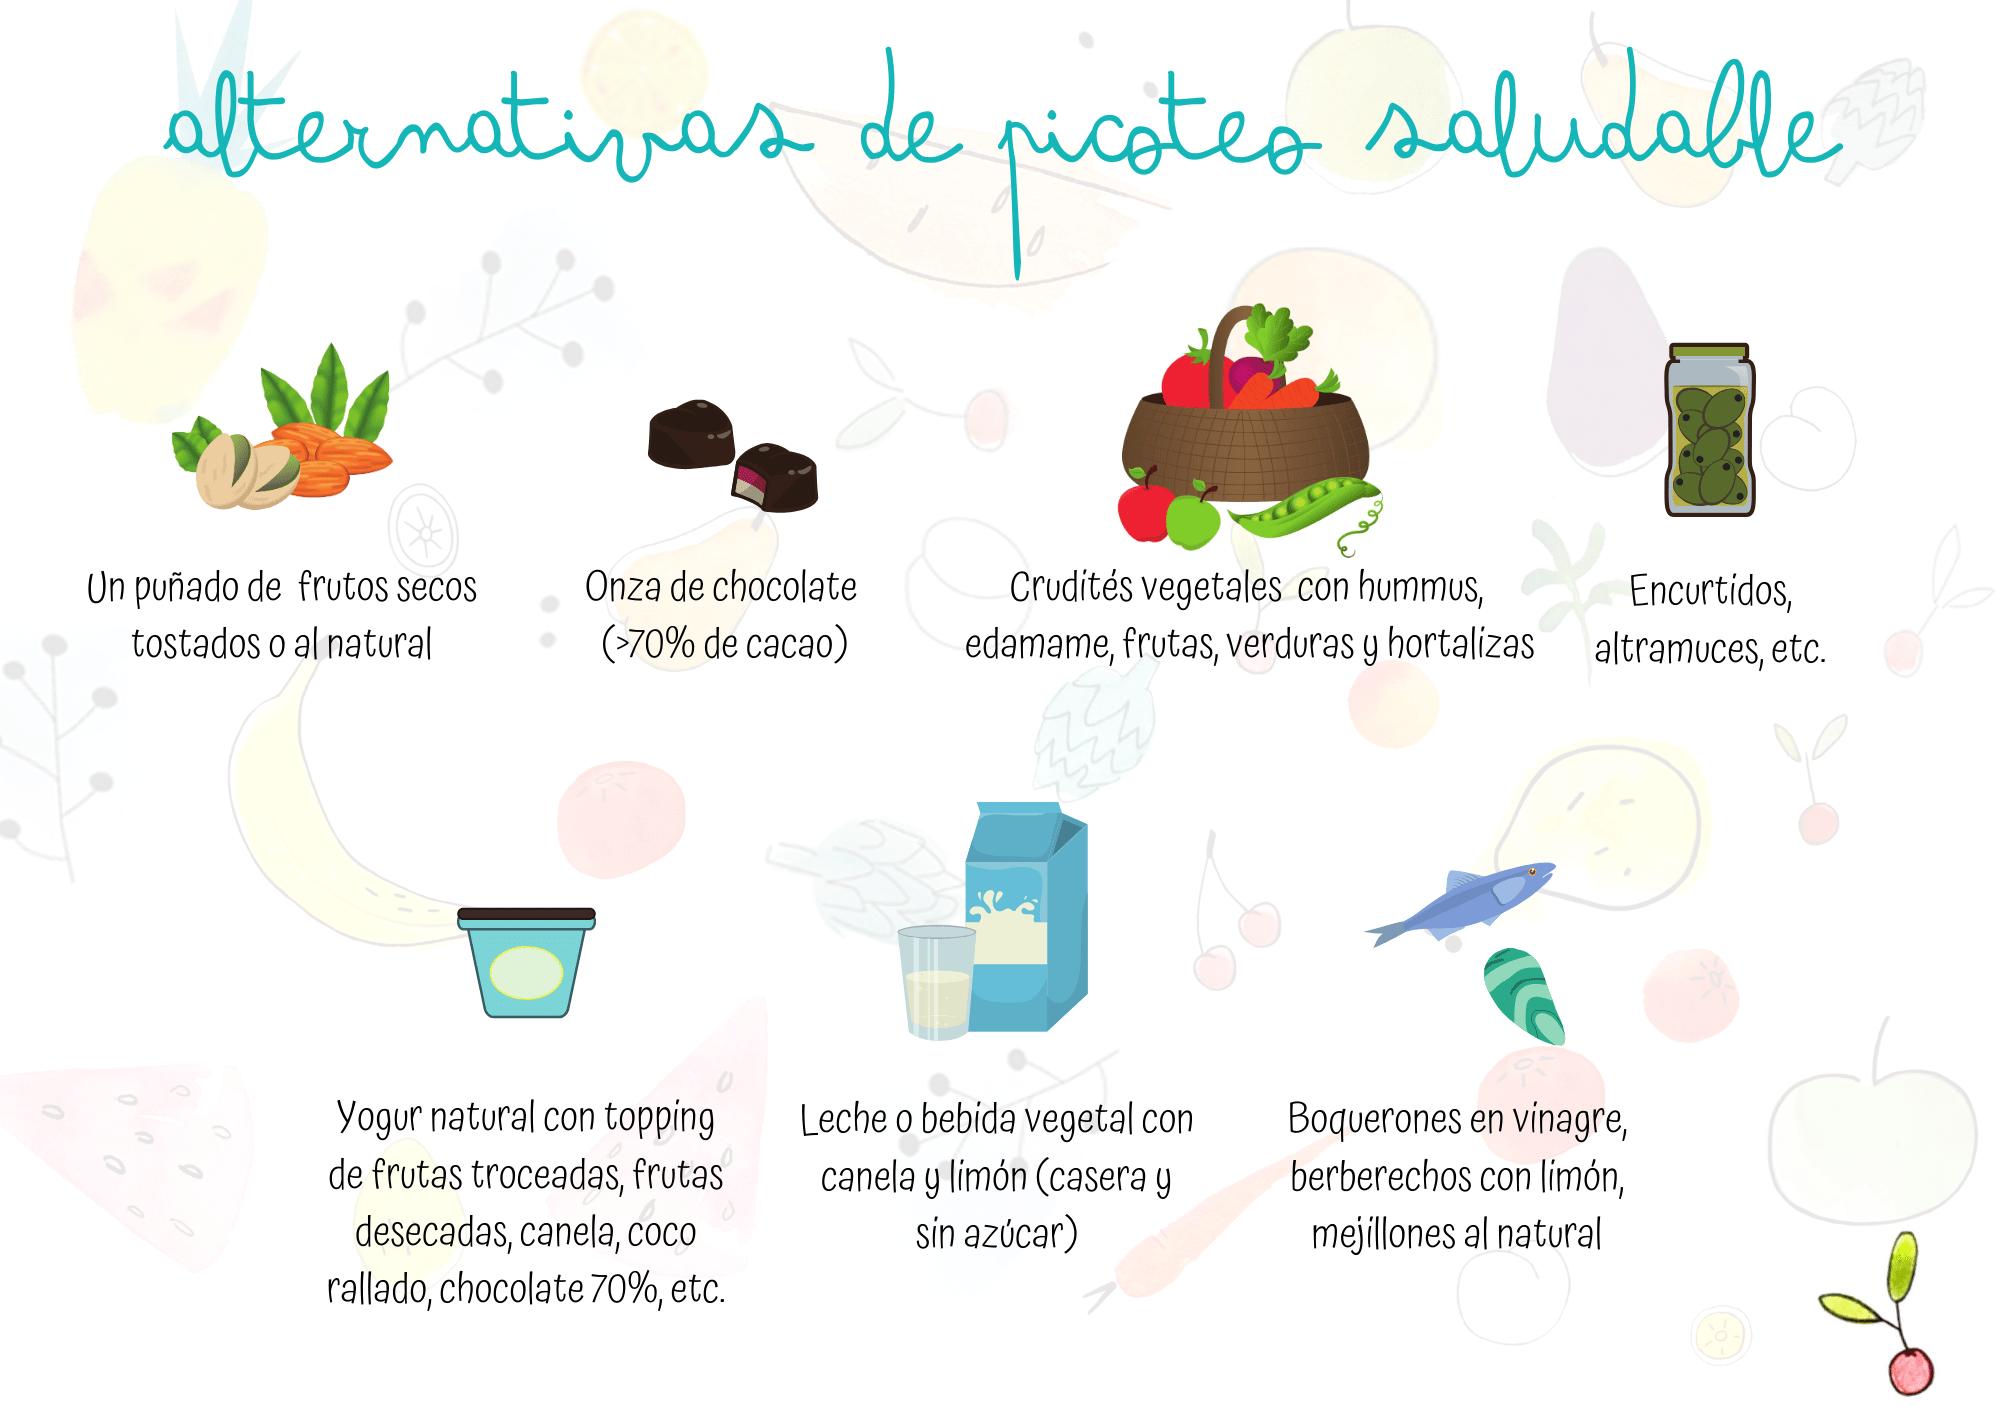 PICOTEO SALUDABLE